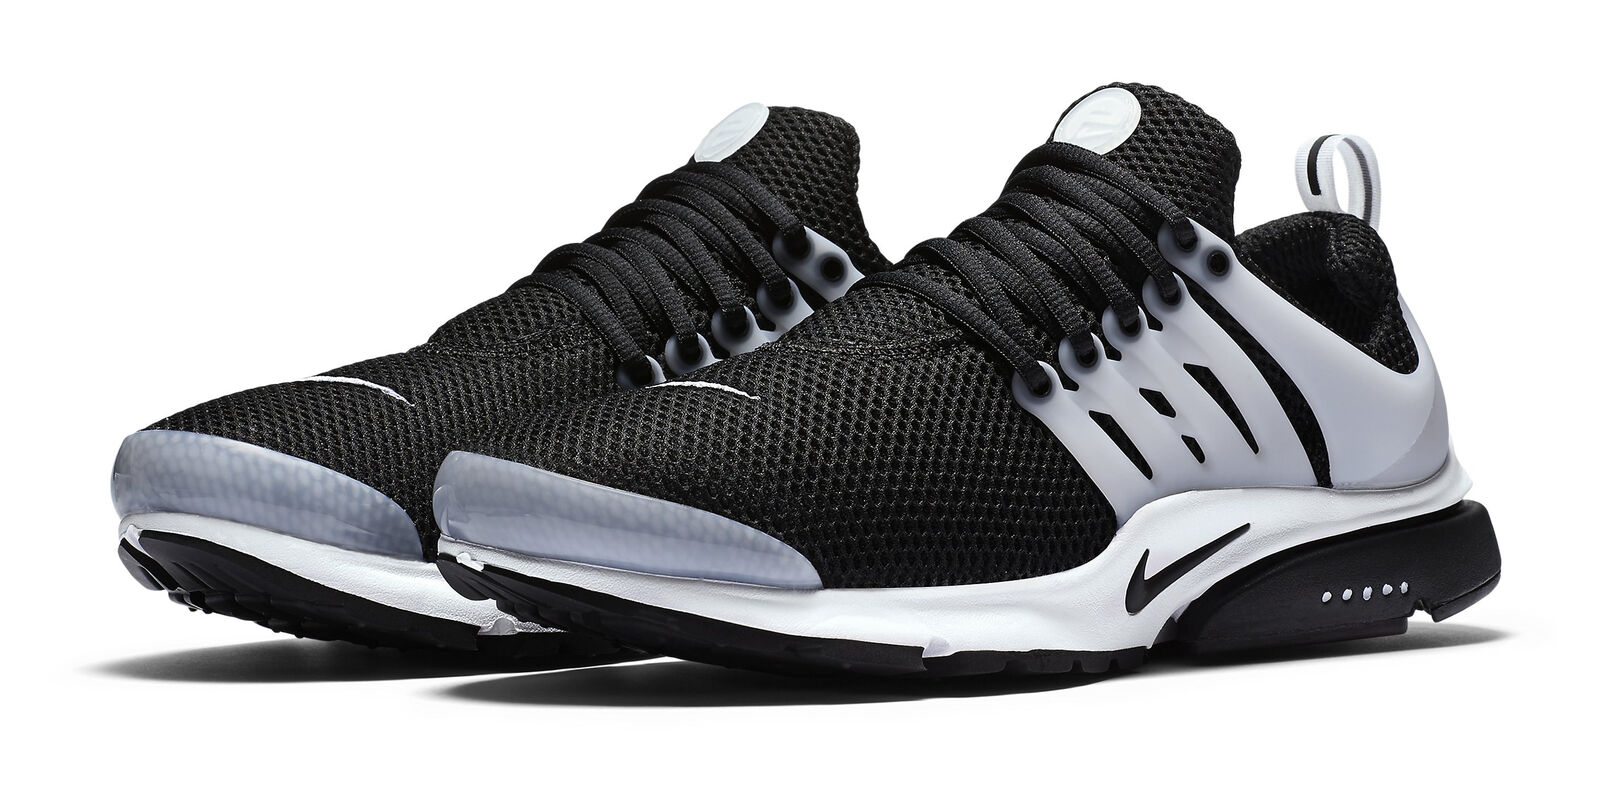 Nike Air presto (848132-010) Hombre Zapatos / - Negro / Blanco / Zapatos neutral Gris, de nosotros dcf04c